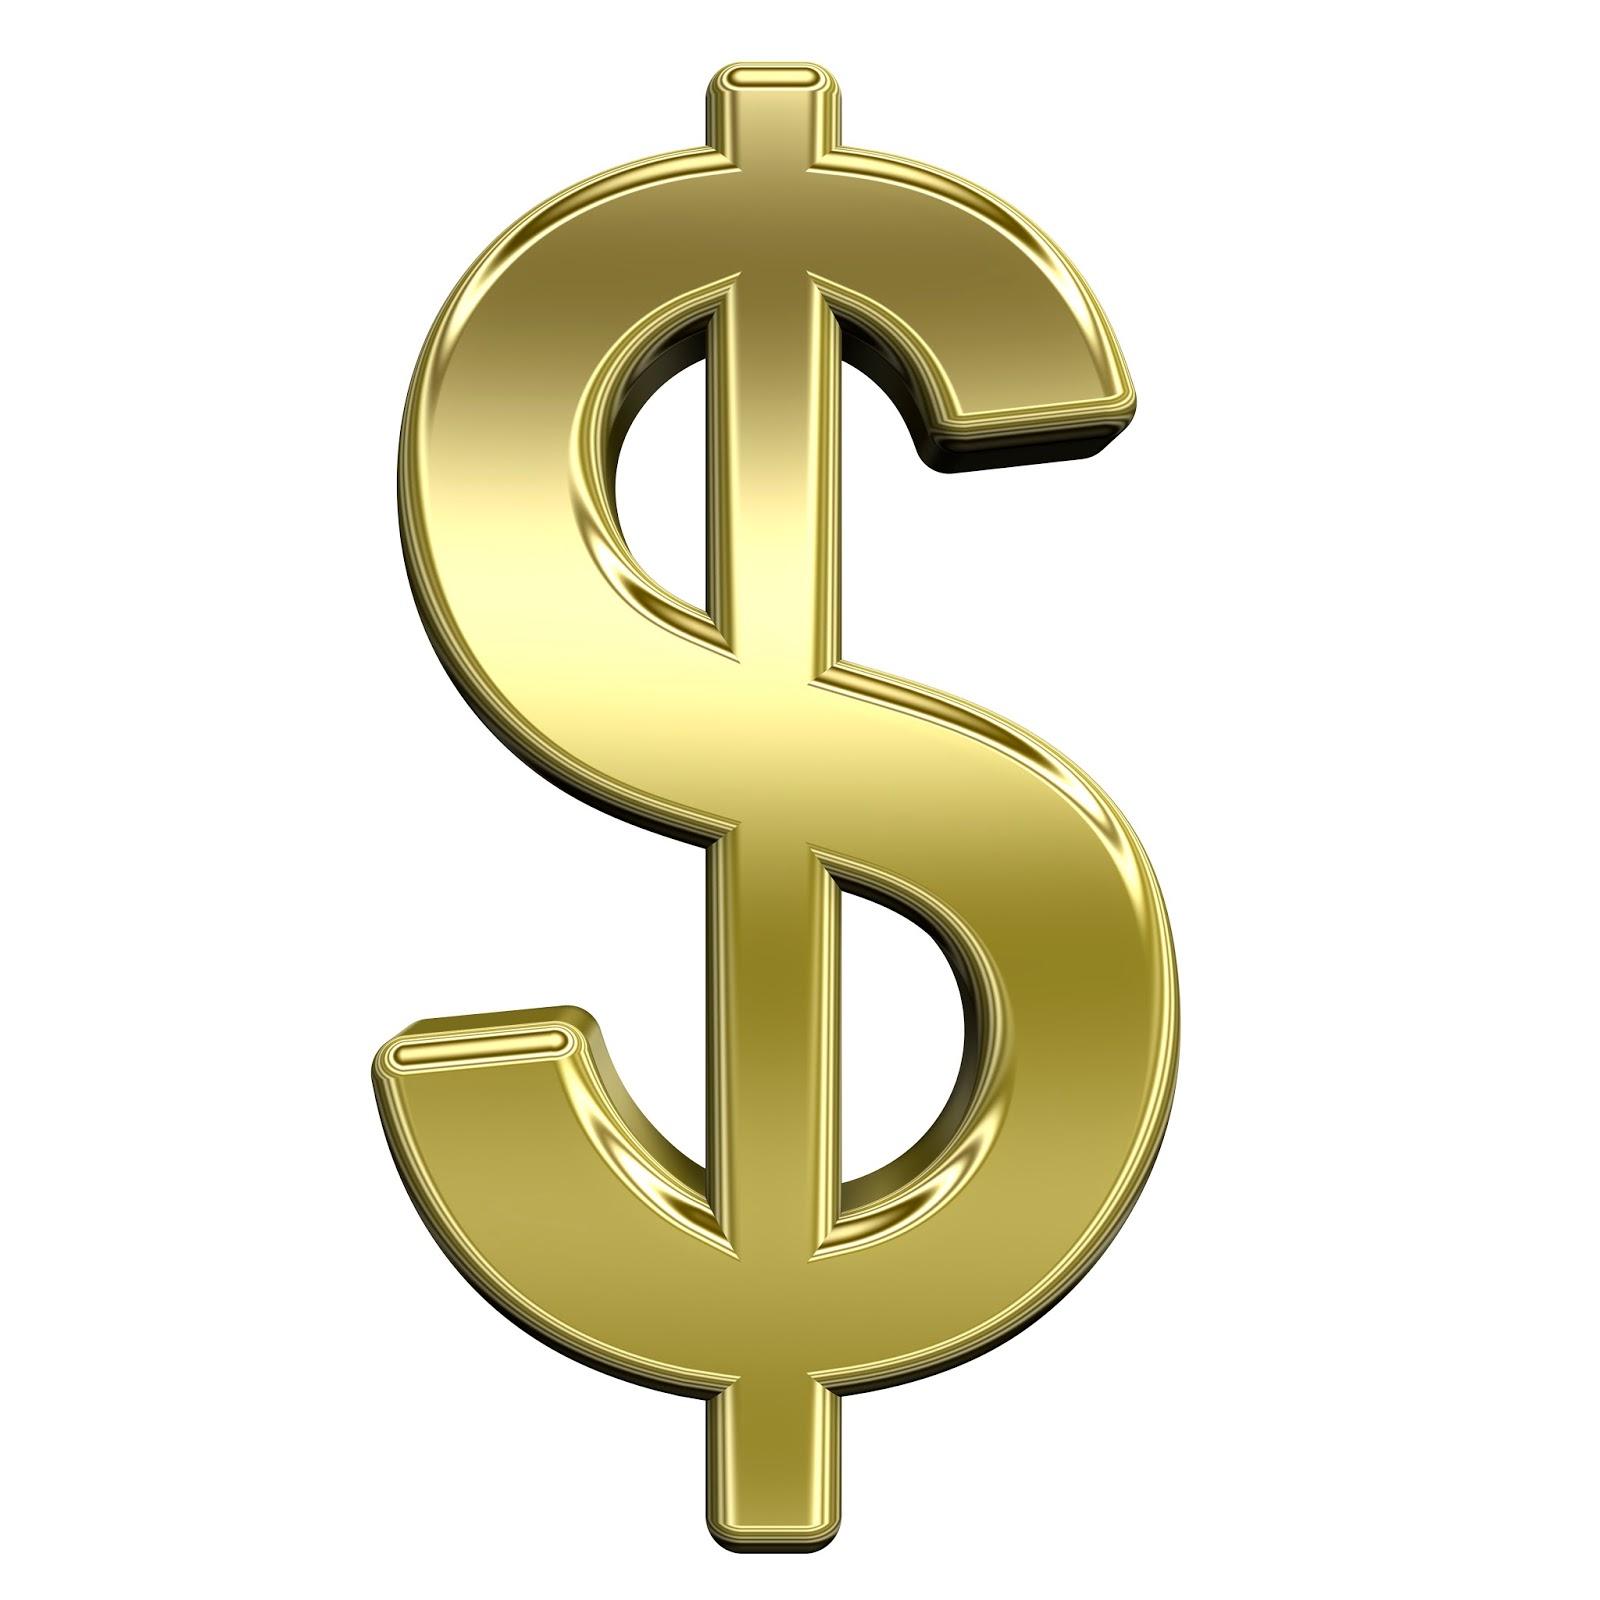 020 Scholarship Essay Prompts Example Dollar Sign From Shiny Gold Alphabet Set Zytbbzso Magnificent Robertson 2018-19 Vanderbilt Washington And Lee Johnson Full